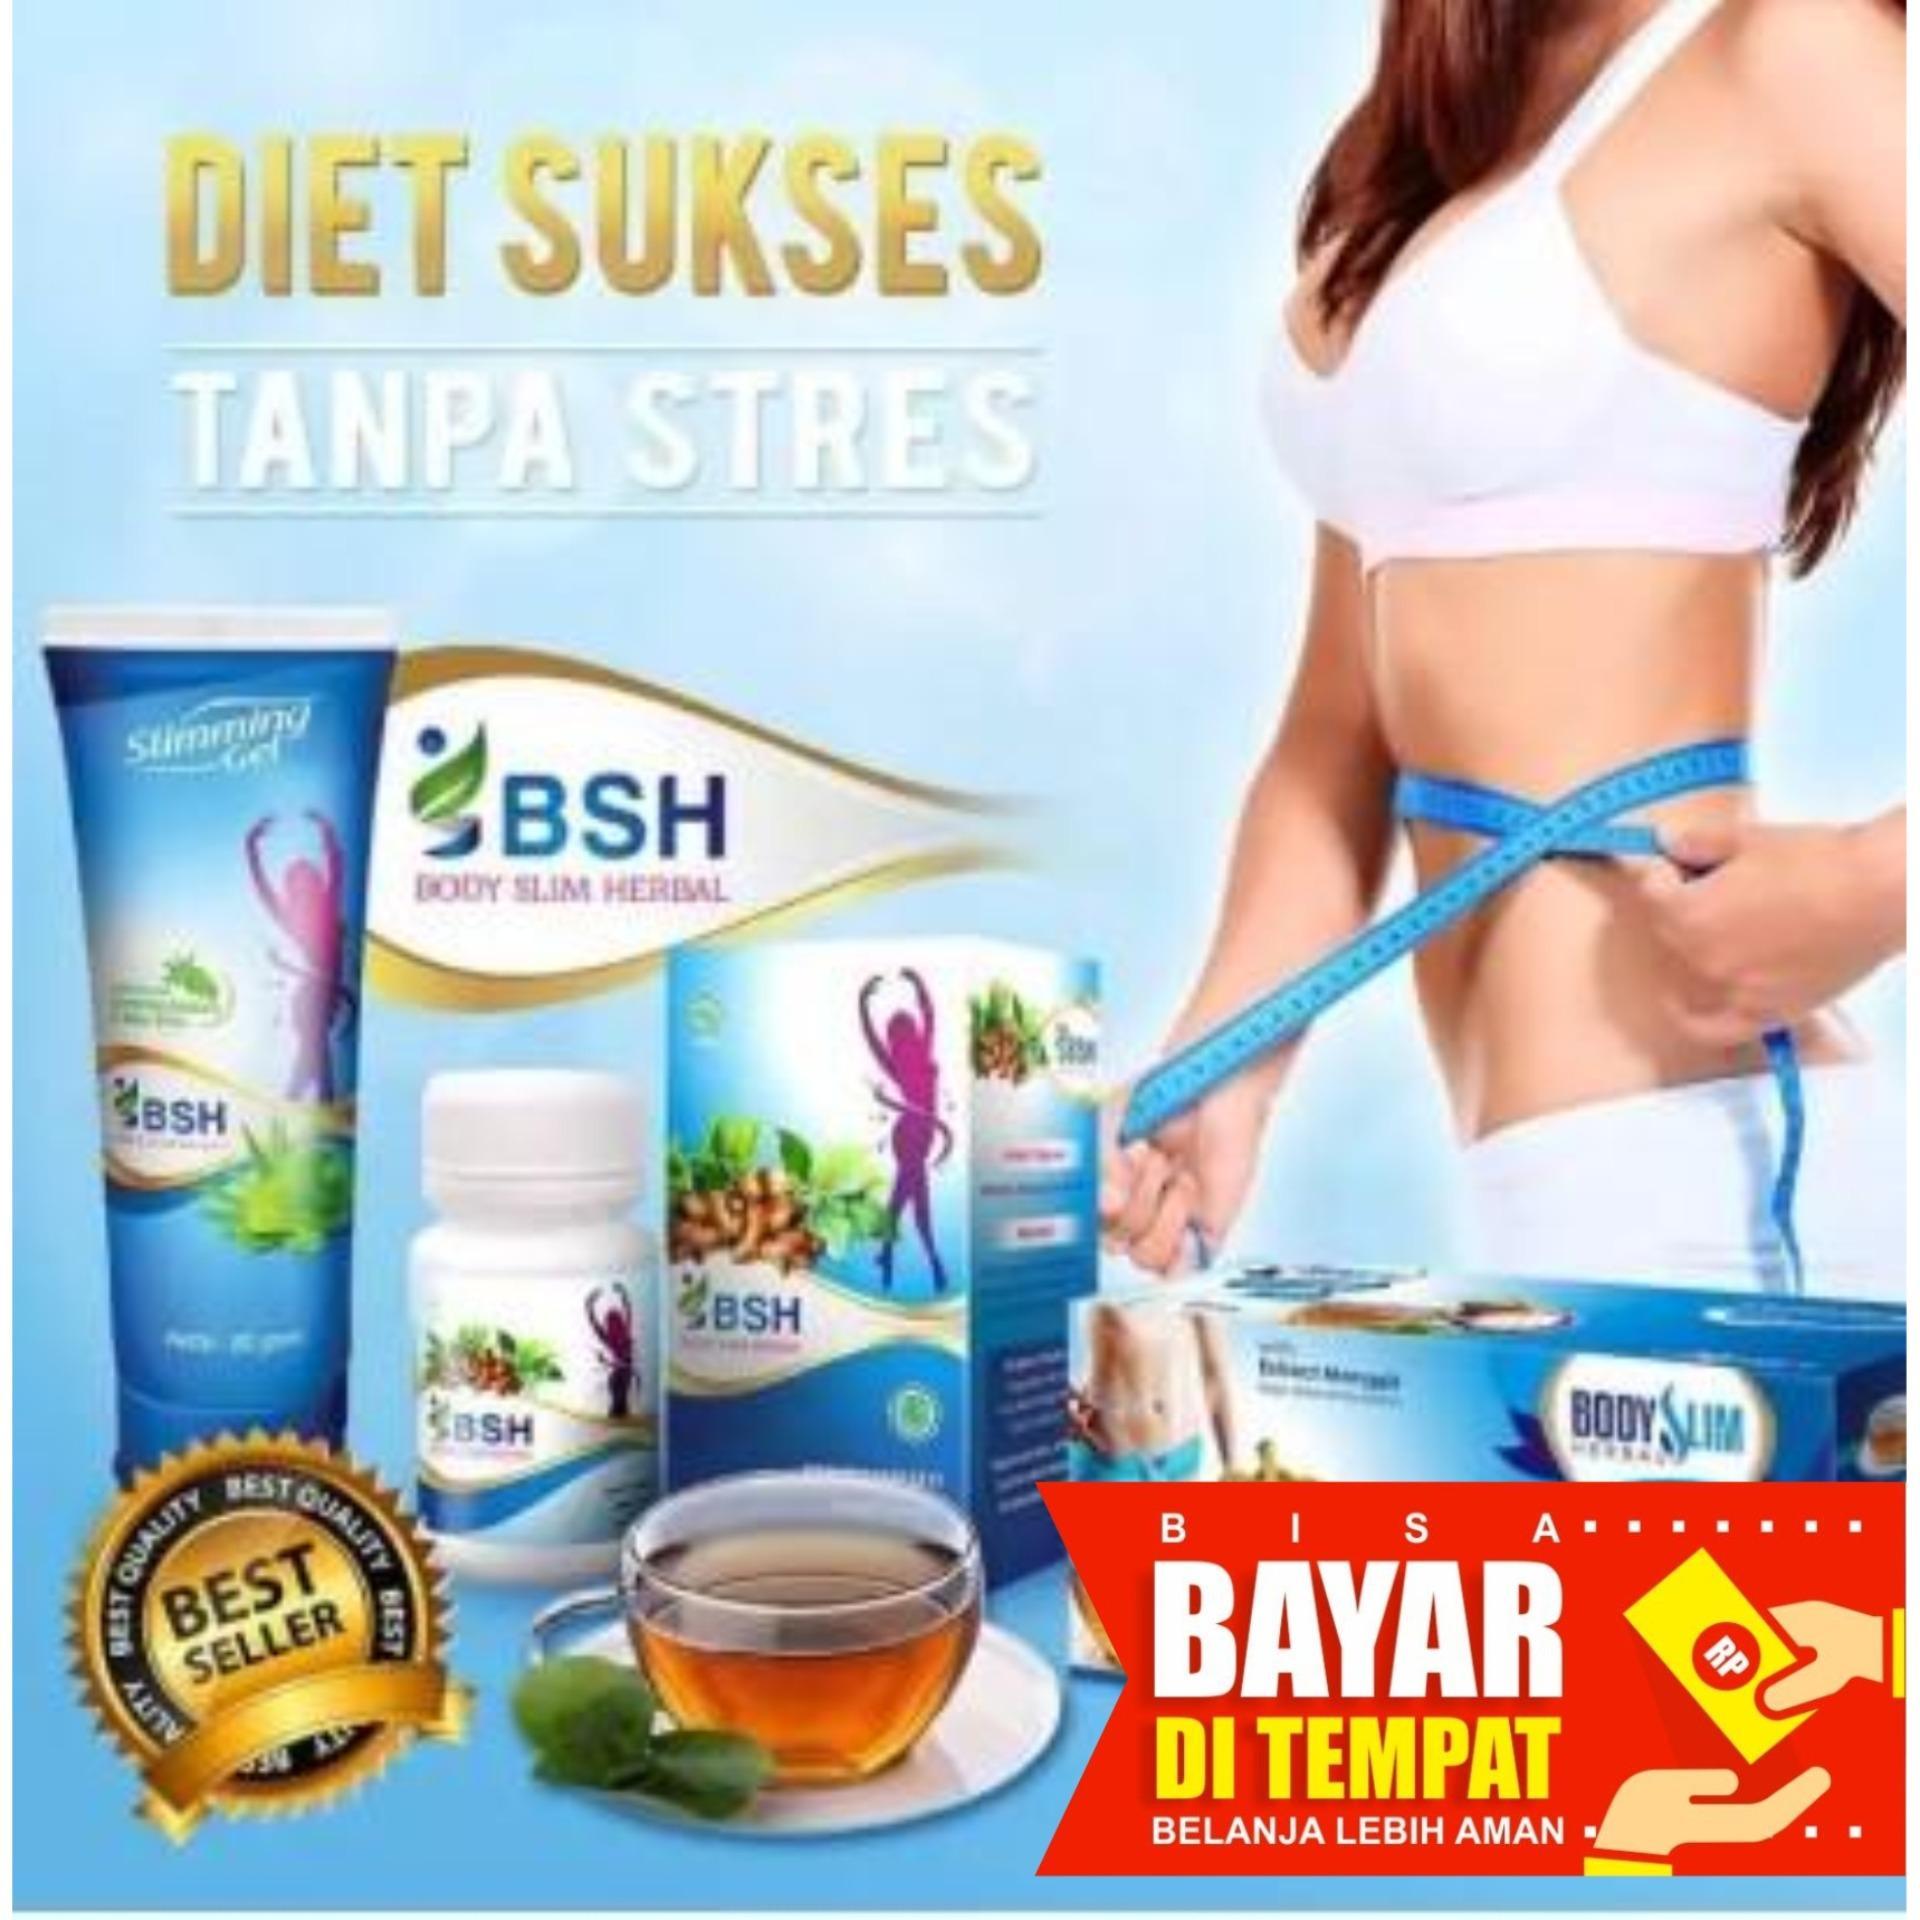 review body produk slim herbal pierderea în greutate de 4 zile